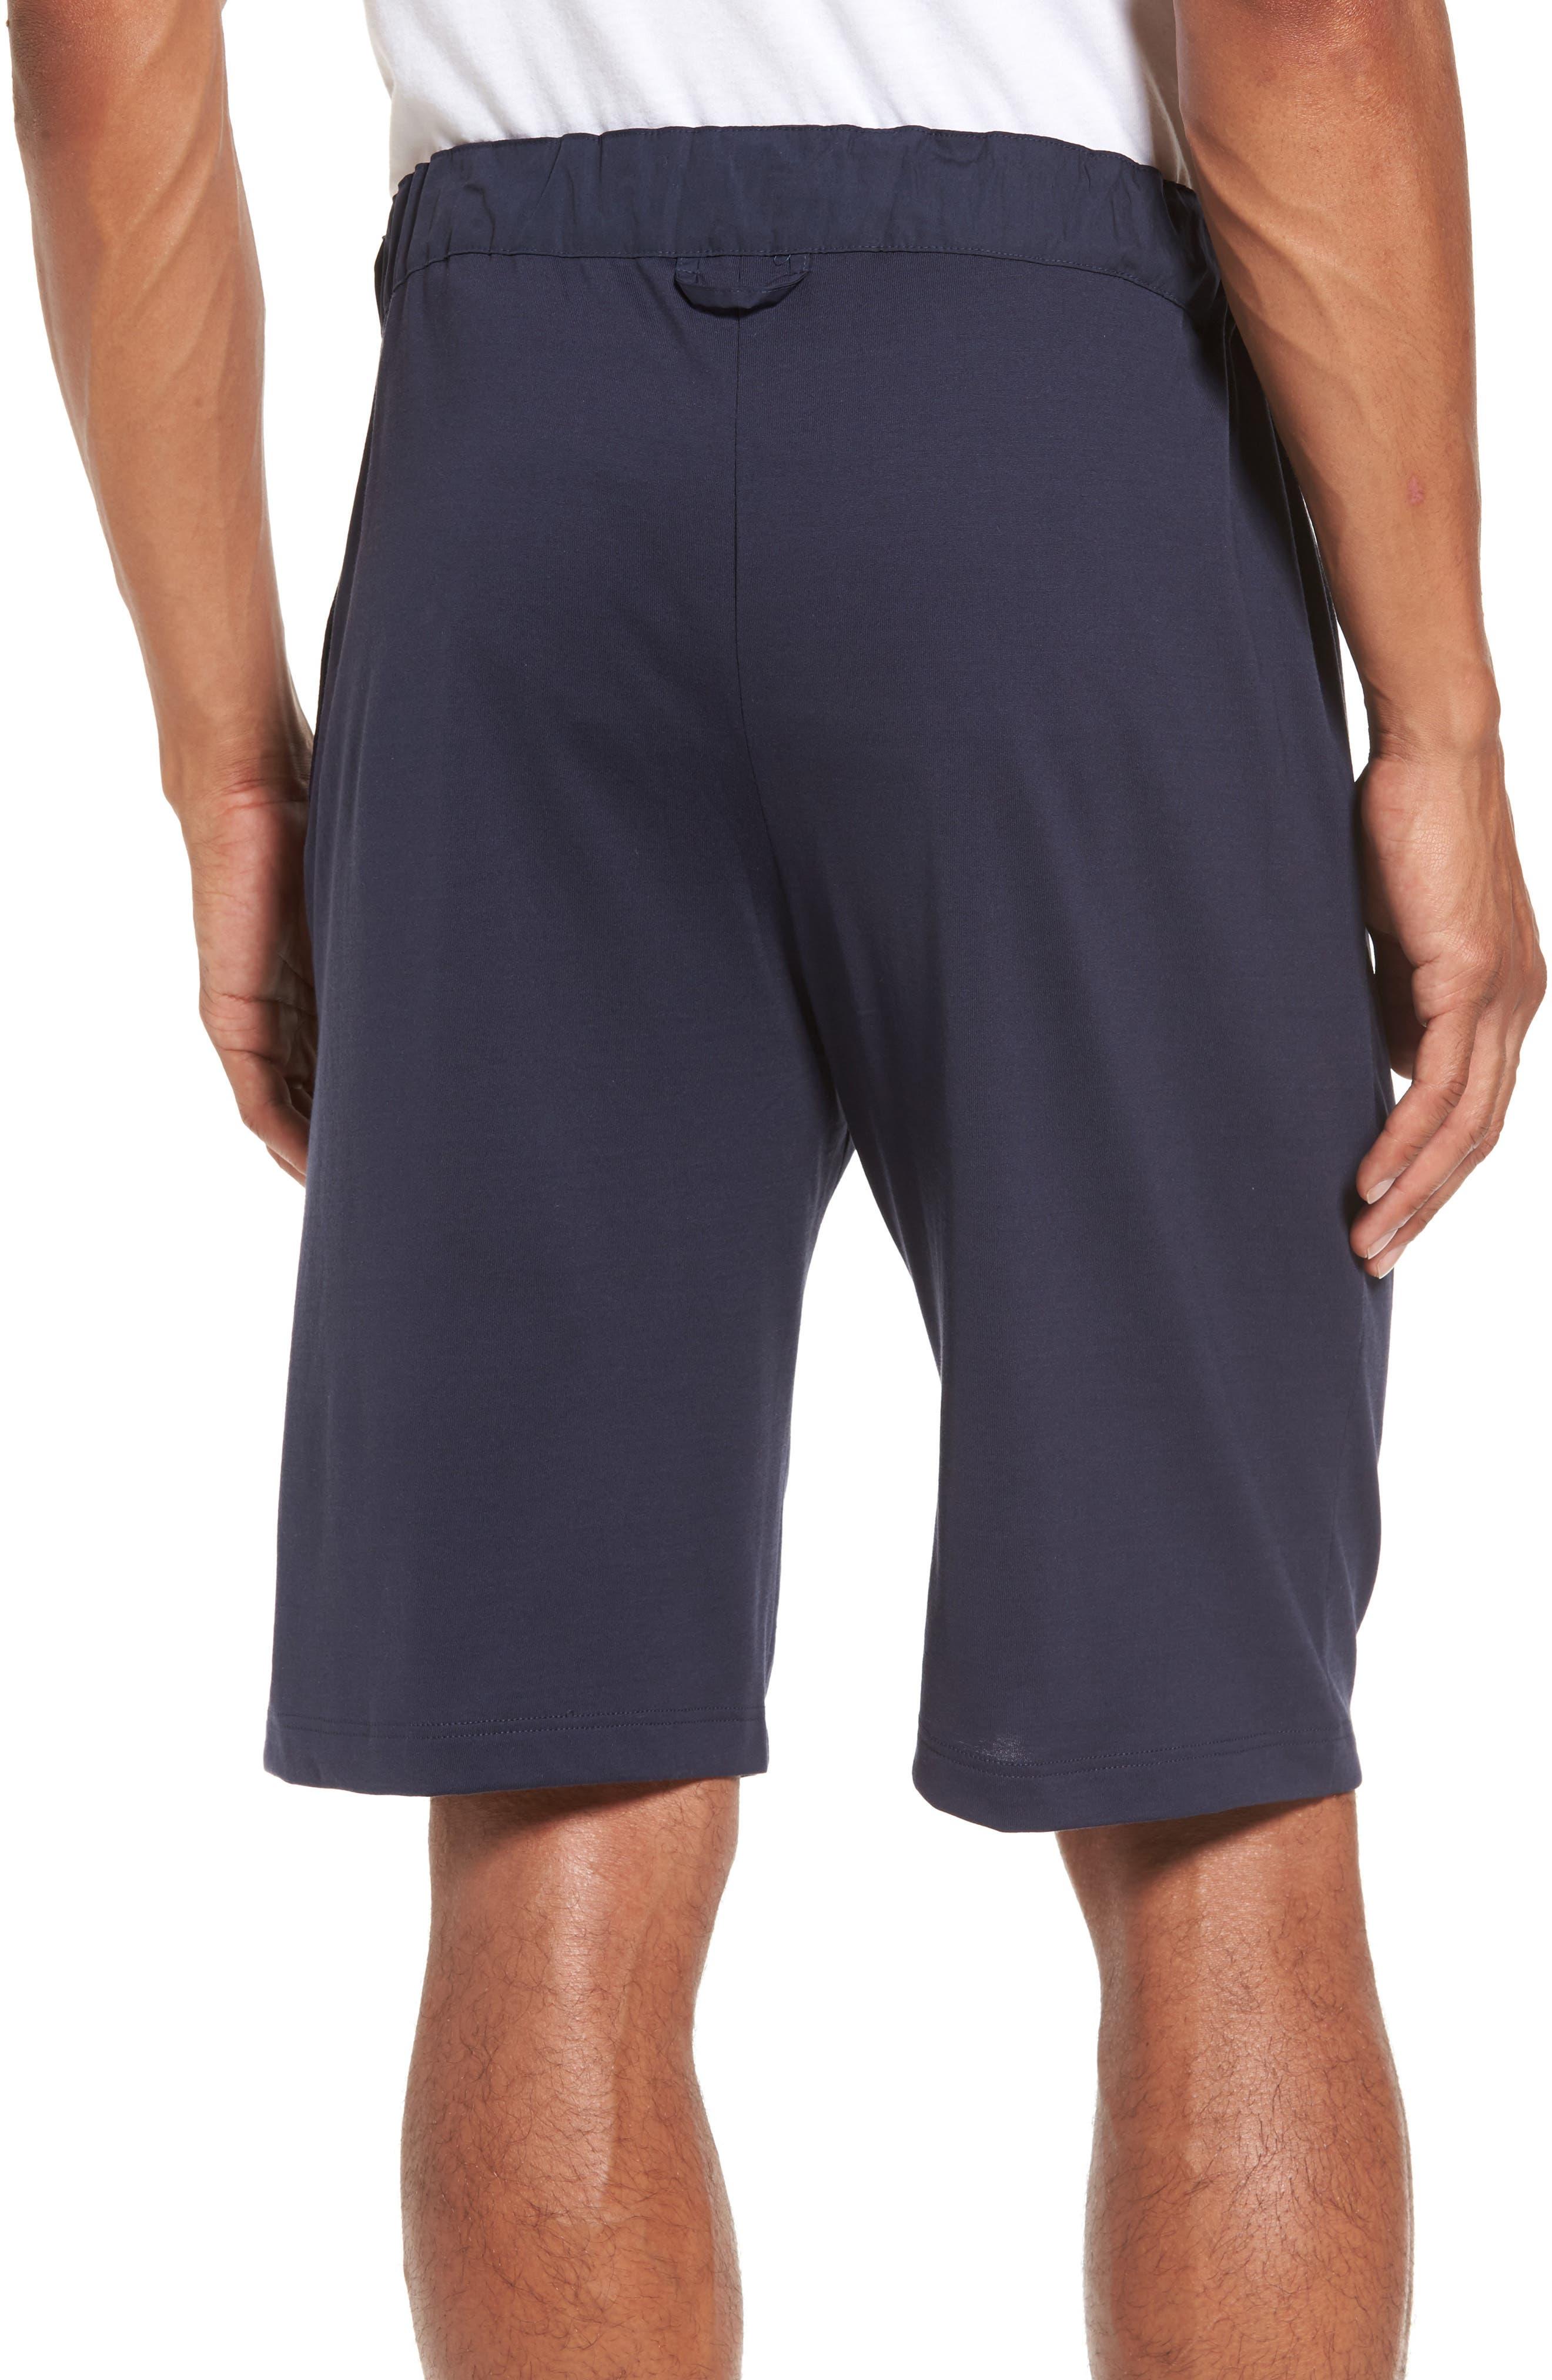 Night & Day Knit Shorts,                             Alternate thumbnail 2, color,                             BLACK IRIS